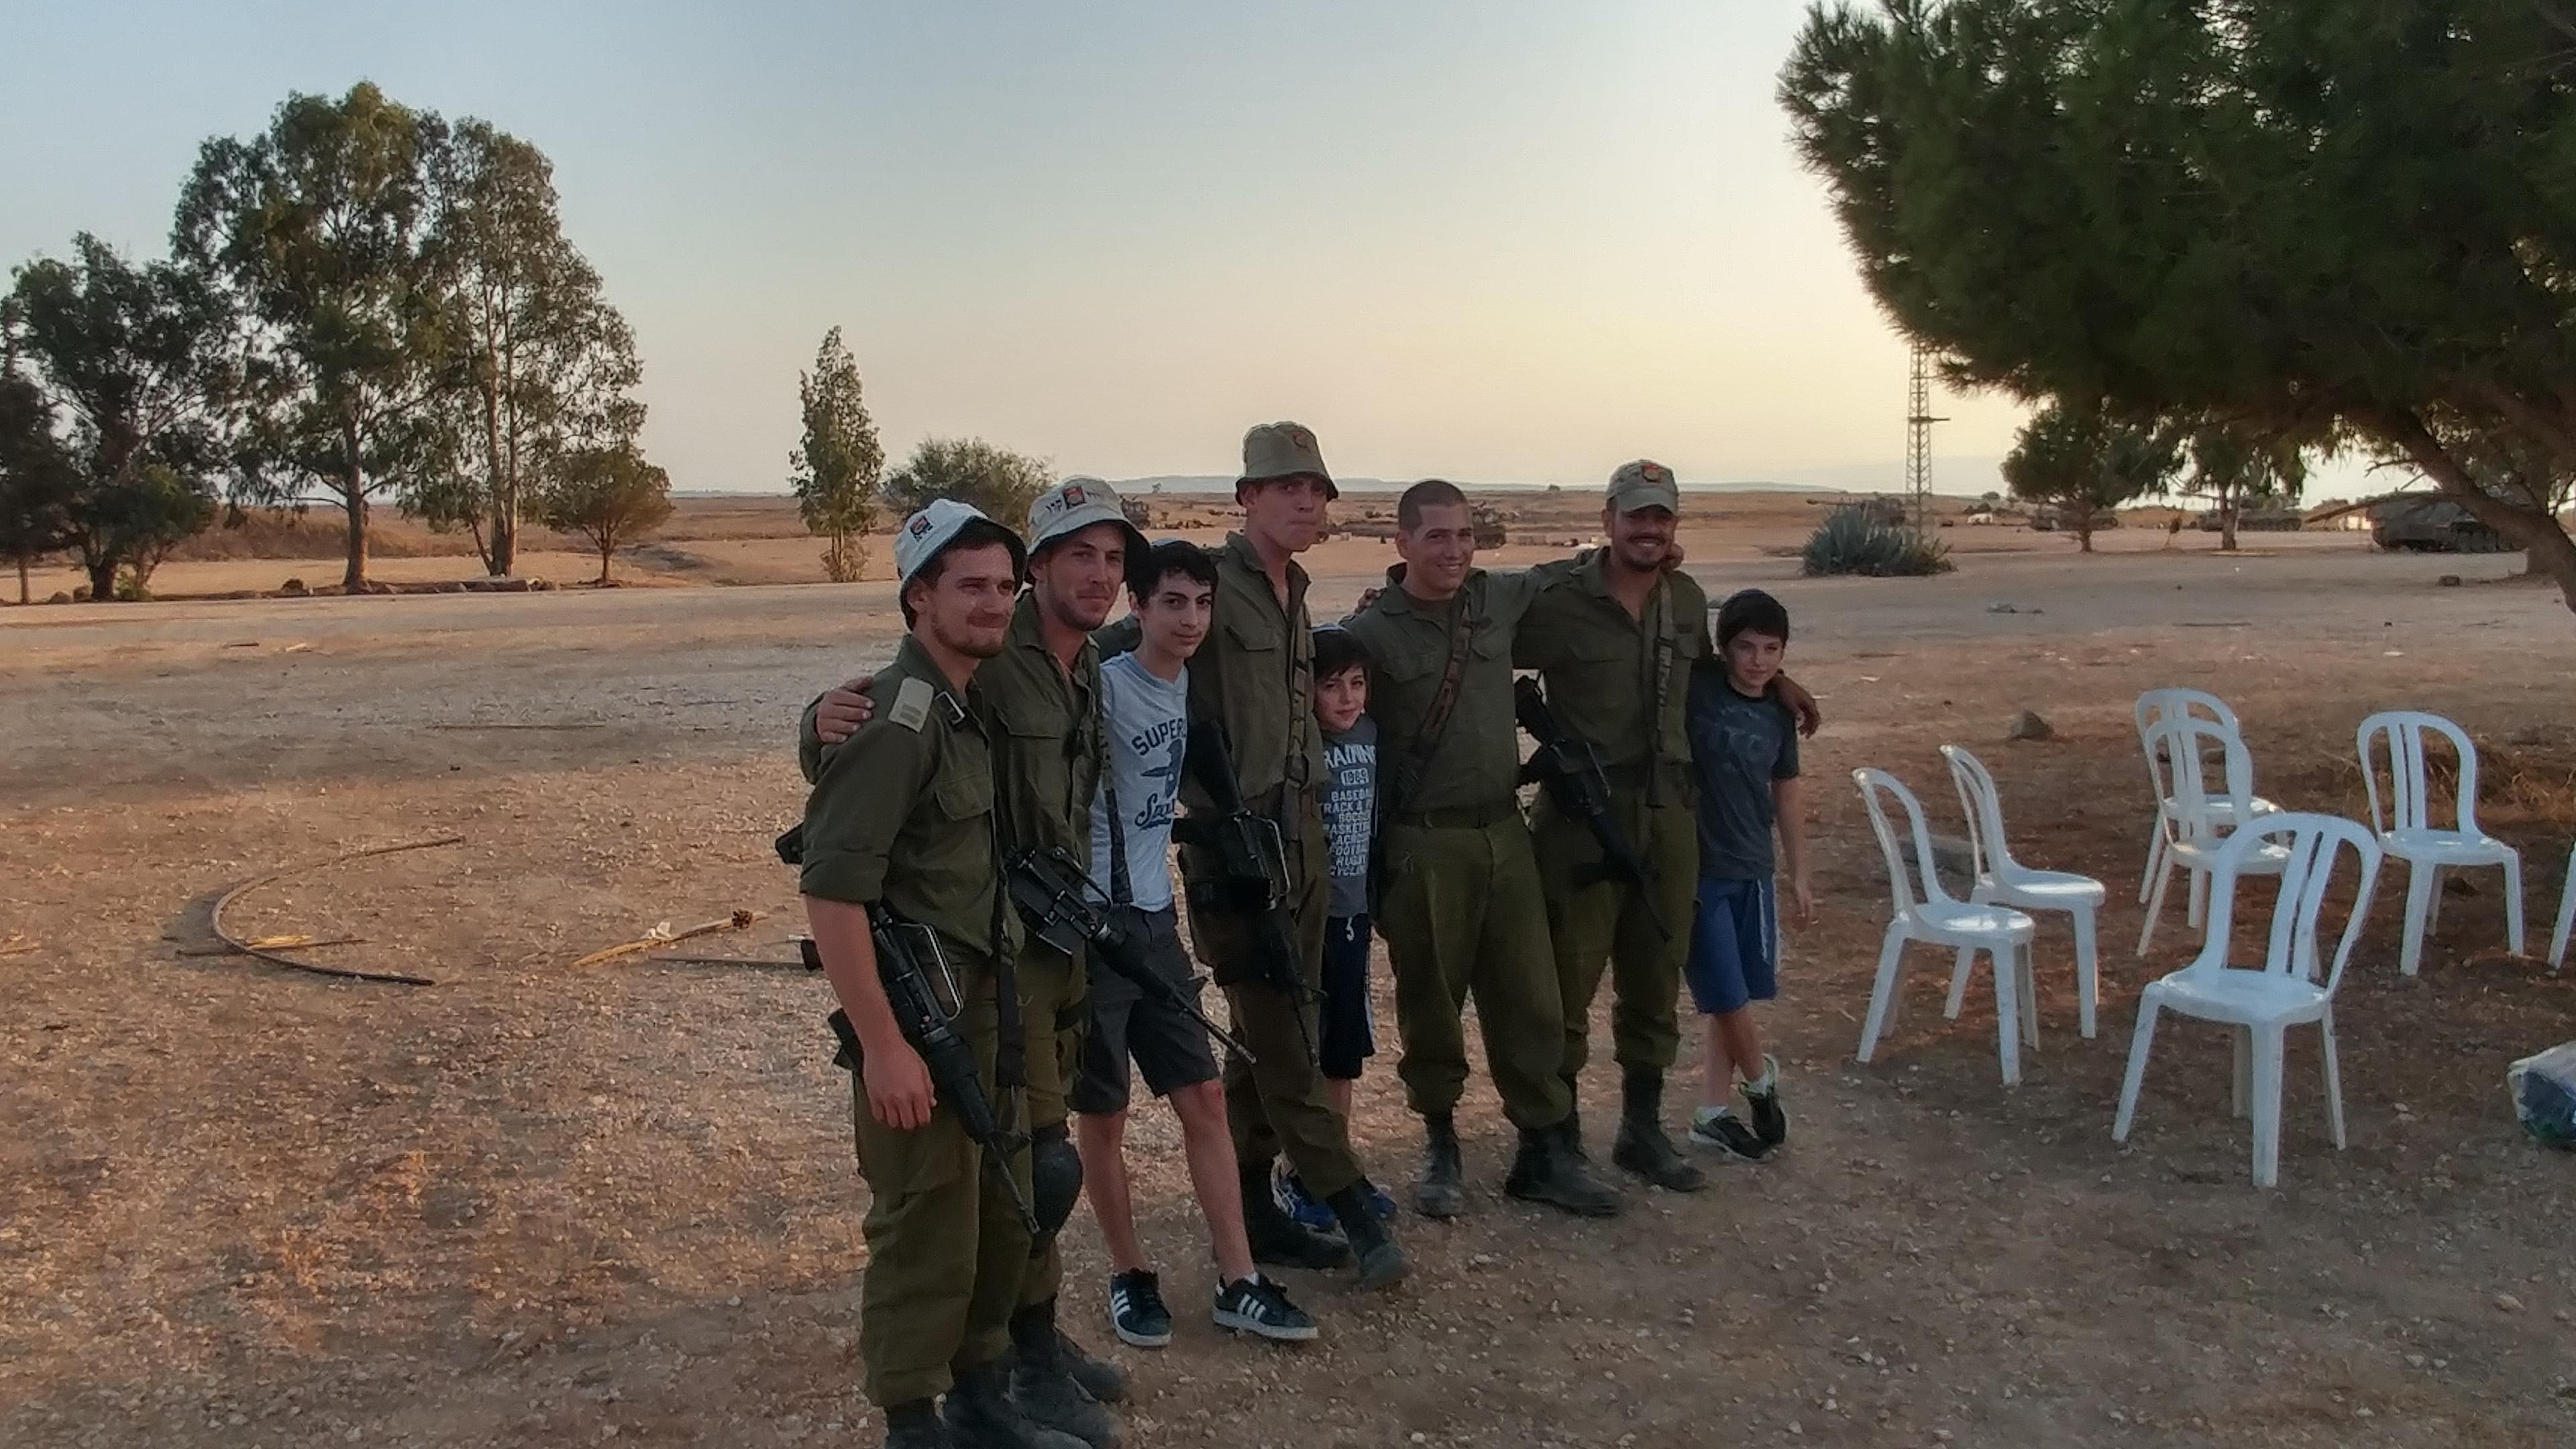 FAMILY & GROUP JUDEA EXPERIENCE